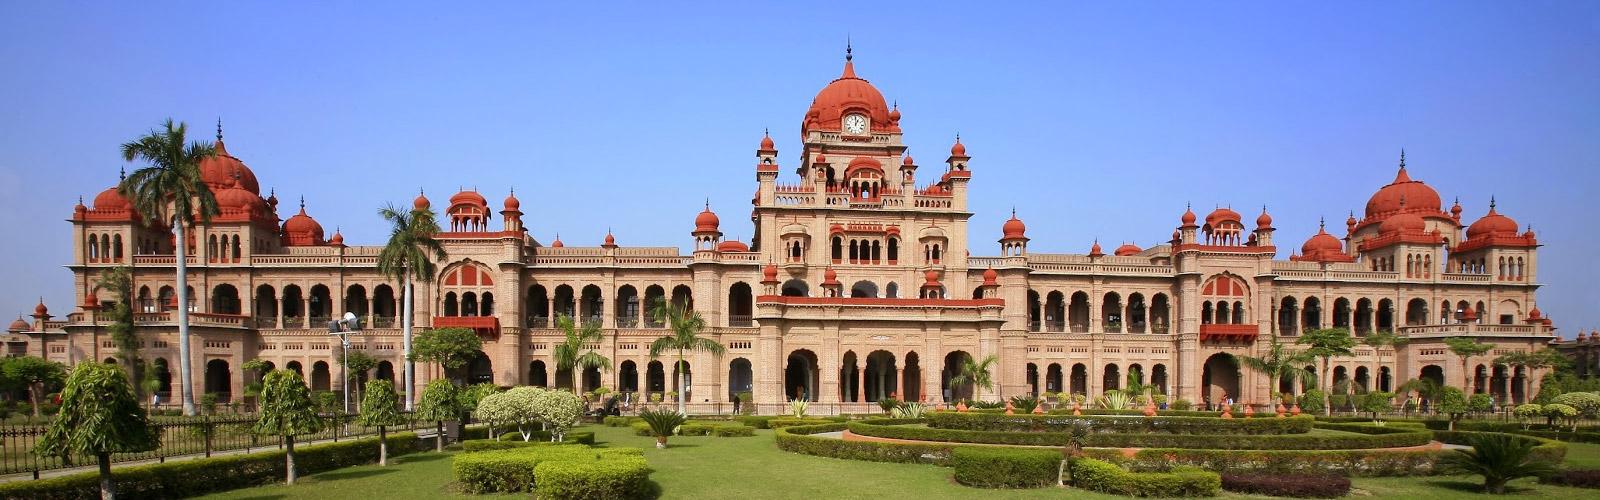 Khalsa College, Amritsar Image